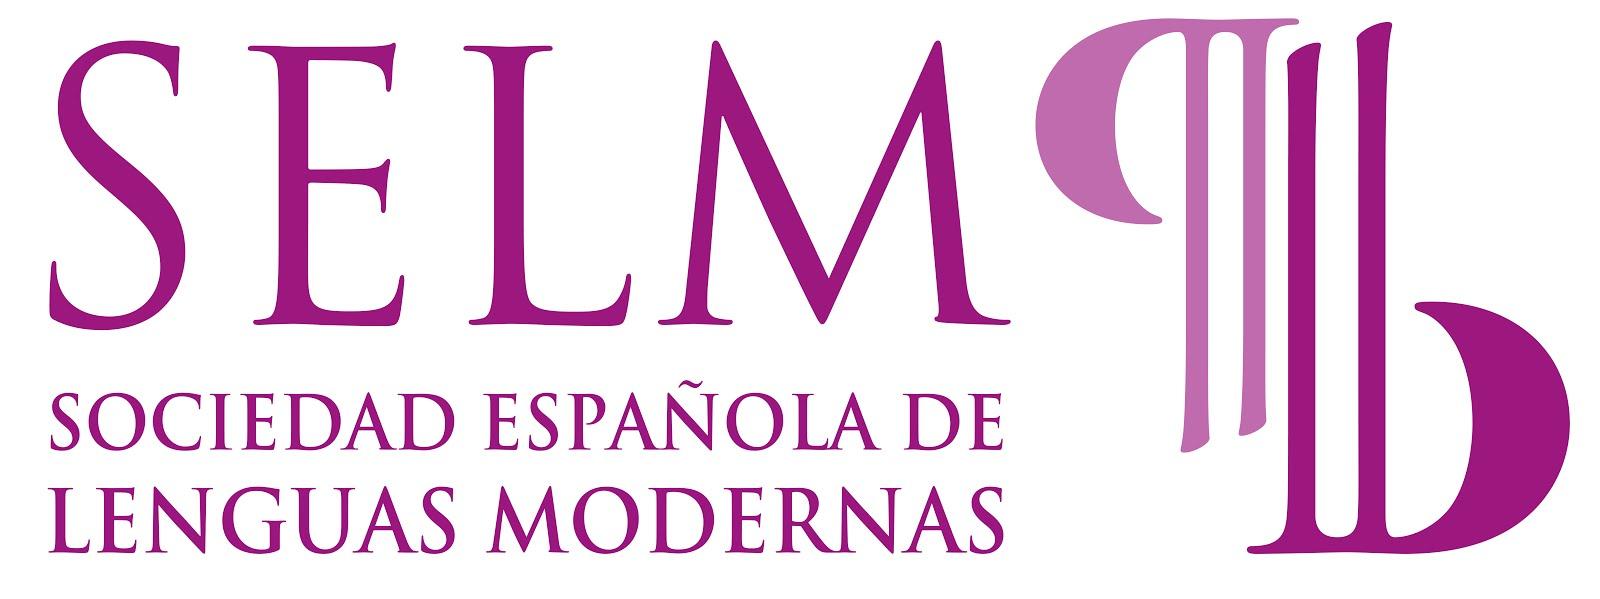 Socia de la Sociedad Española de Lenguas Modernas